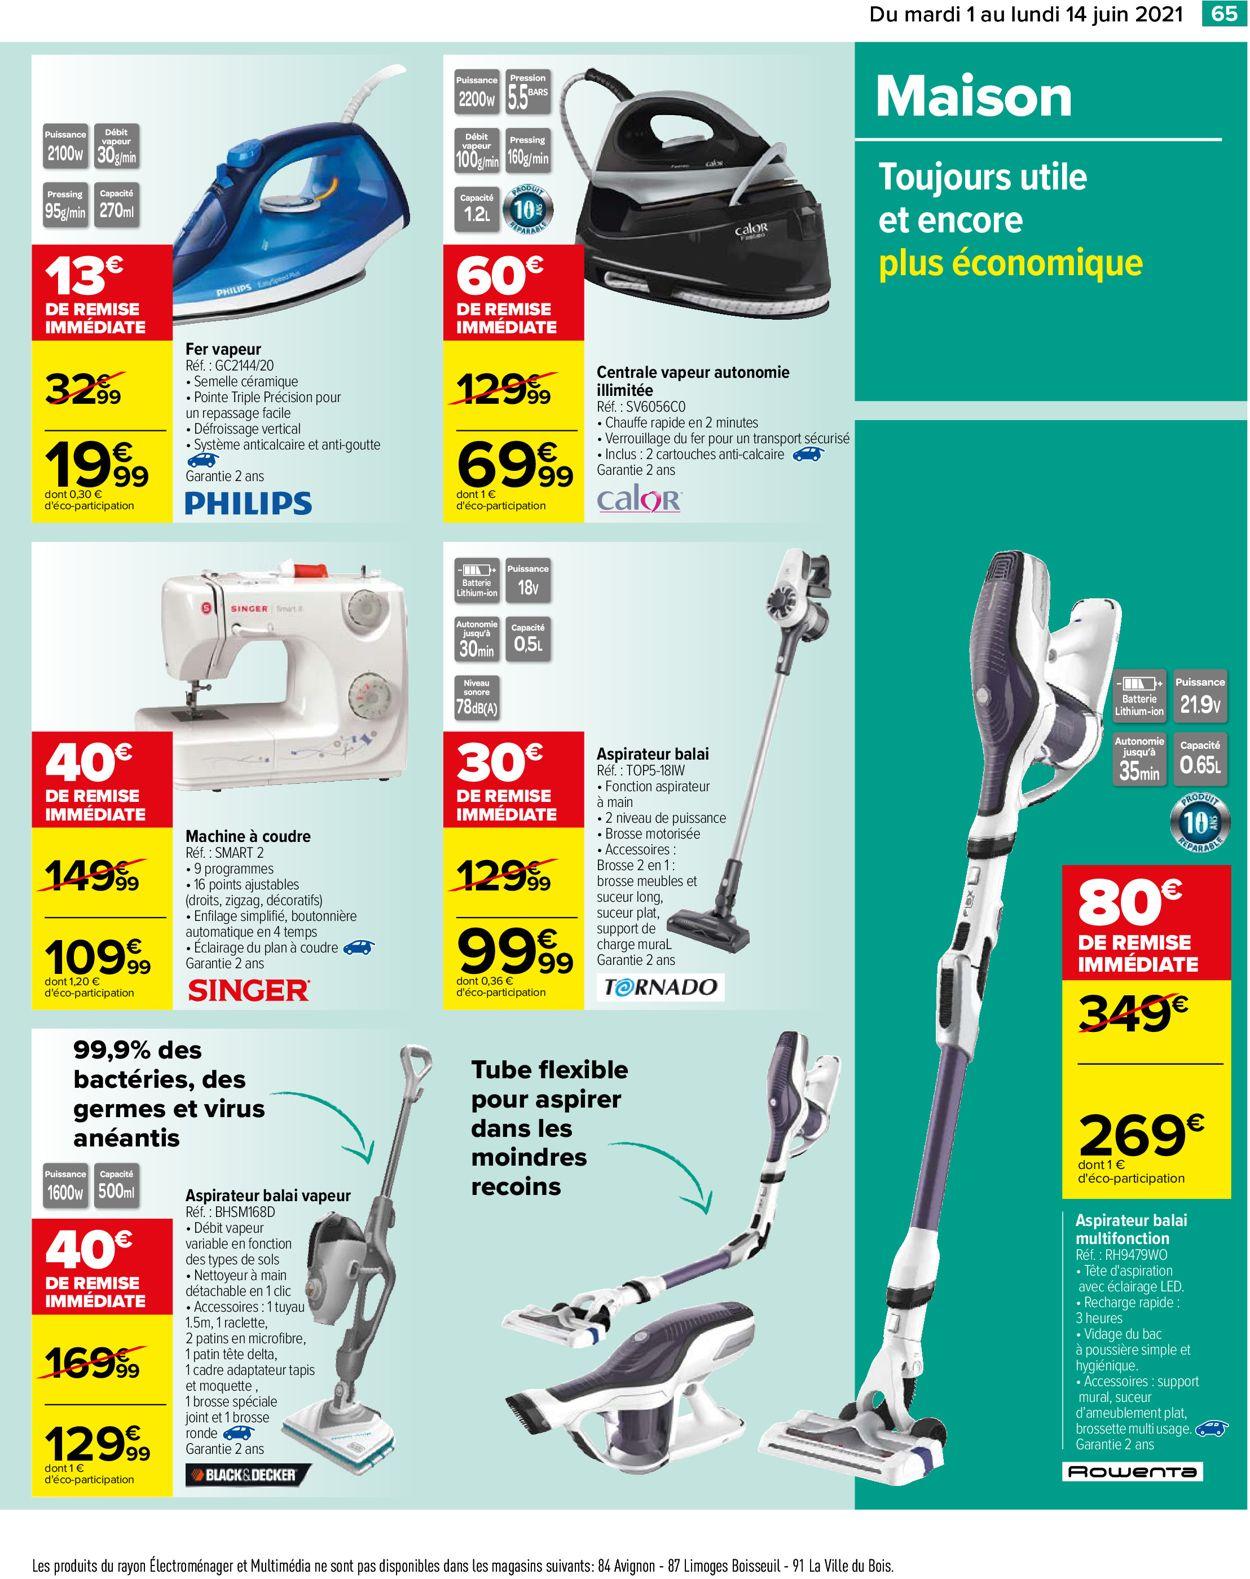 Carrefour Catalogue - 01.06-14.06.2021 (Page 68)